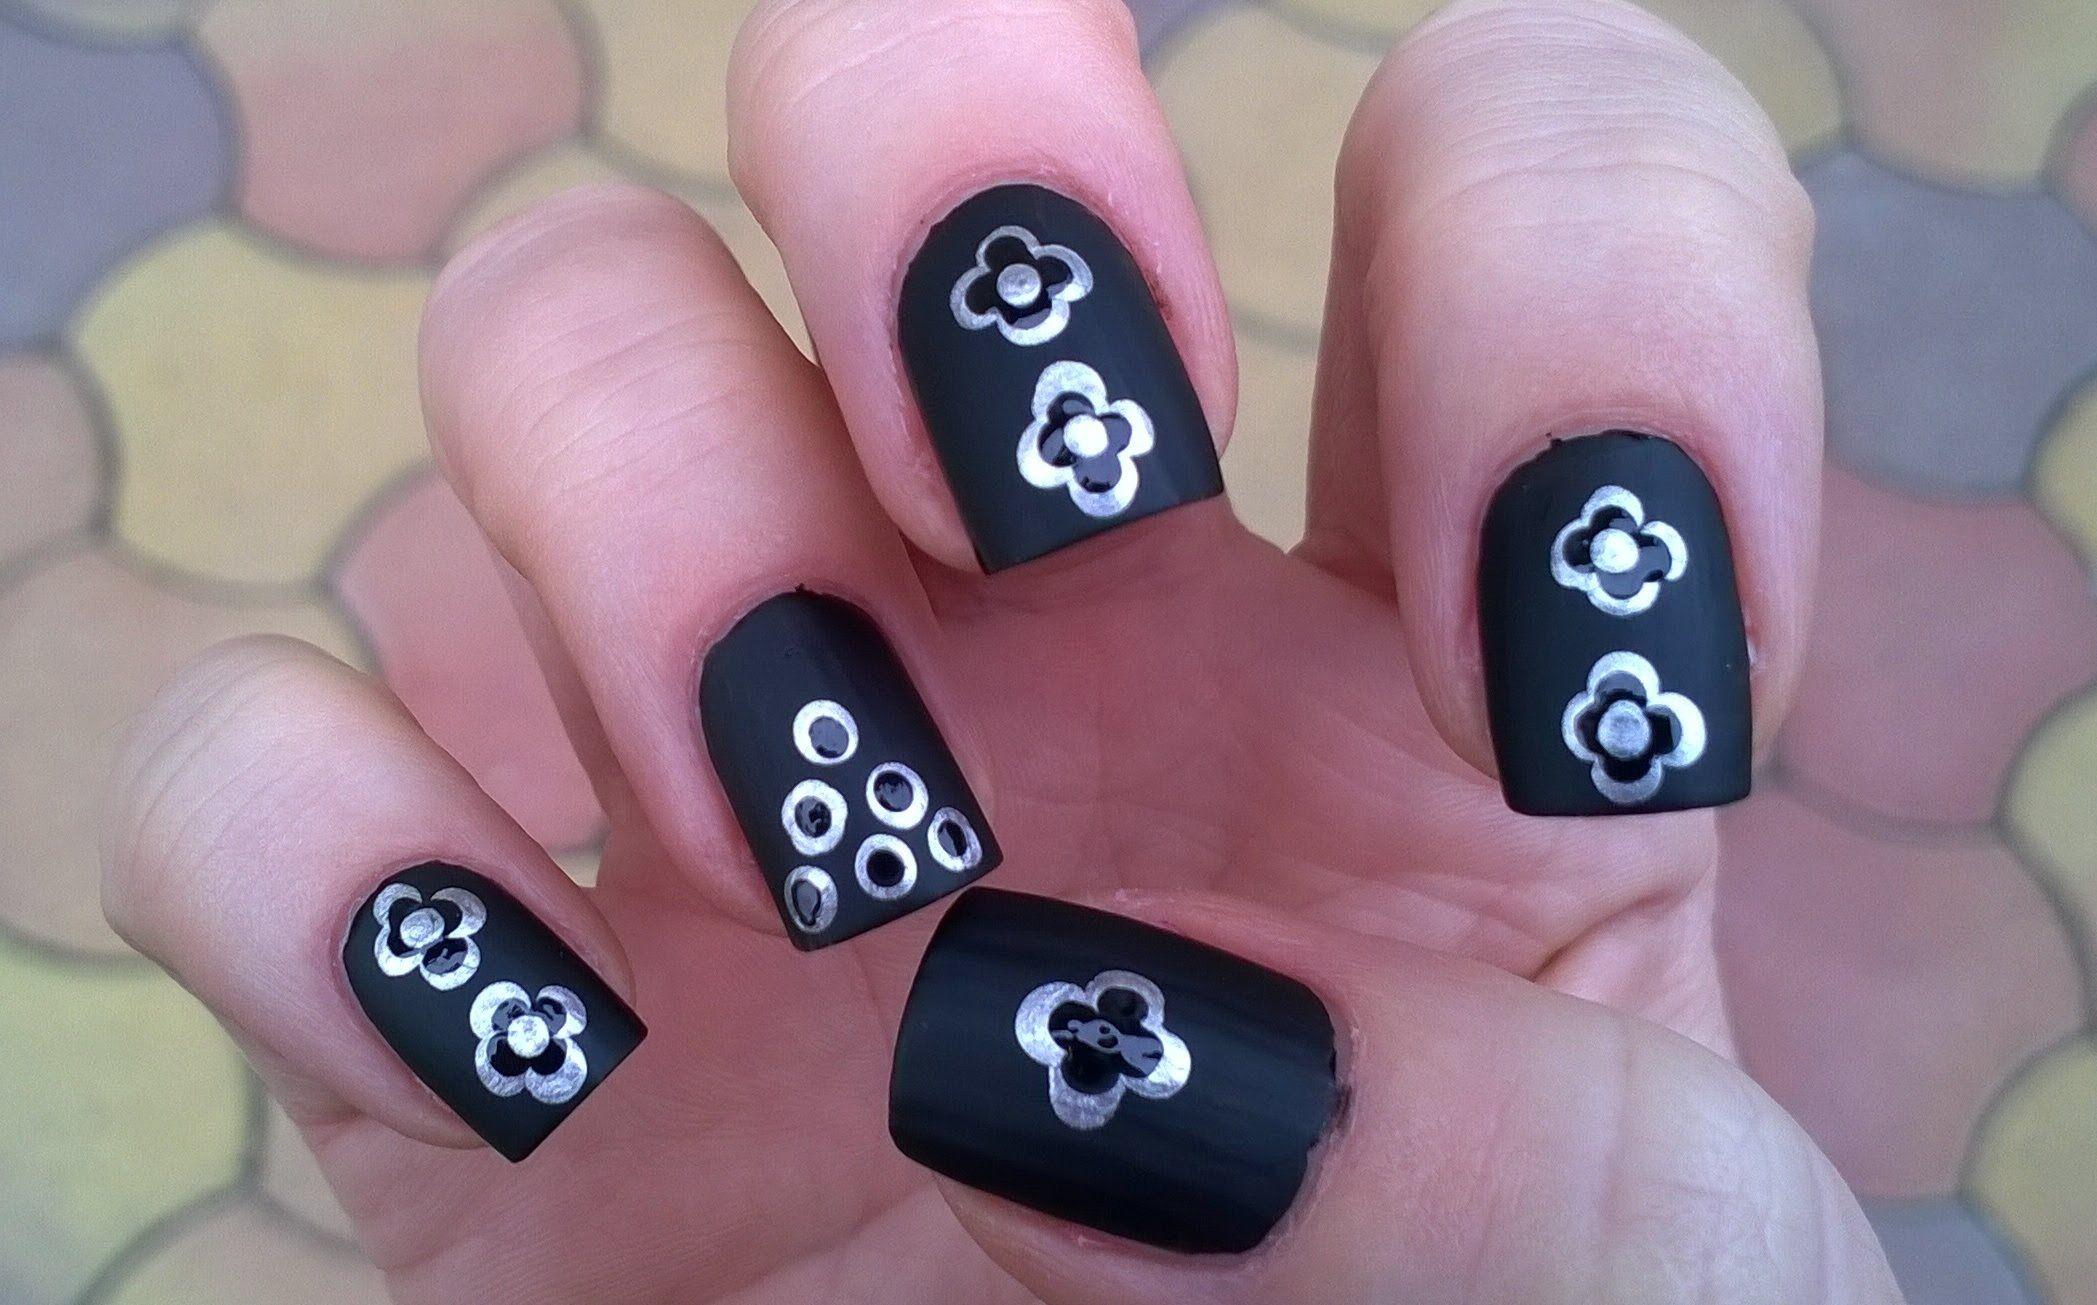 Black matte nail polish designs #3 - Monochrome nails by using ...